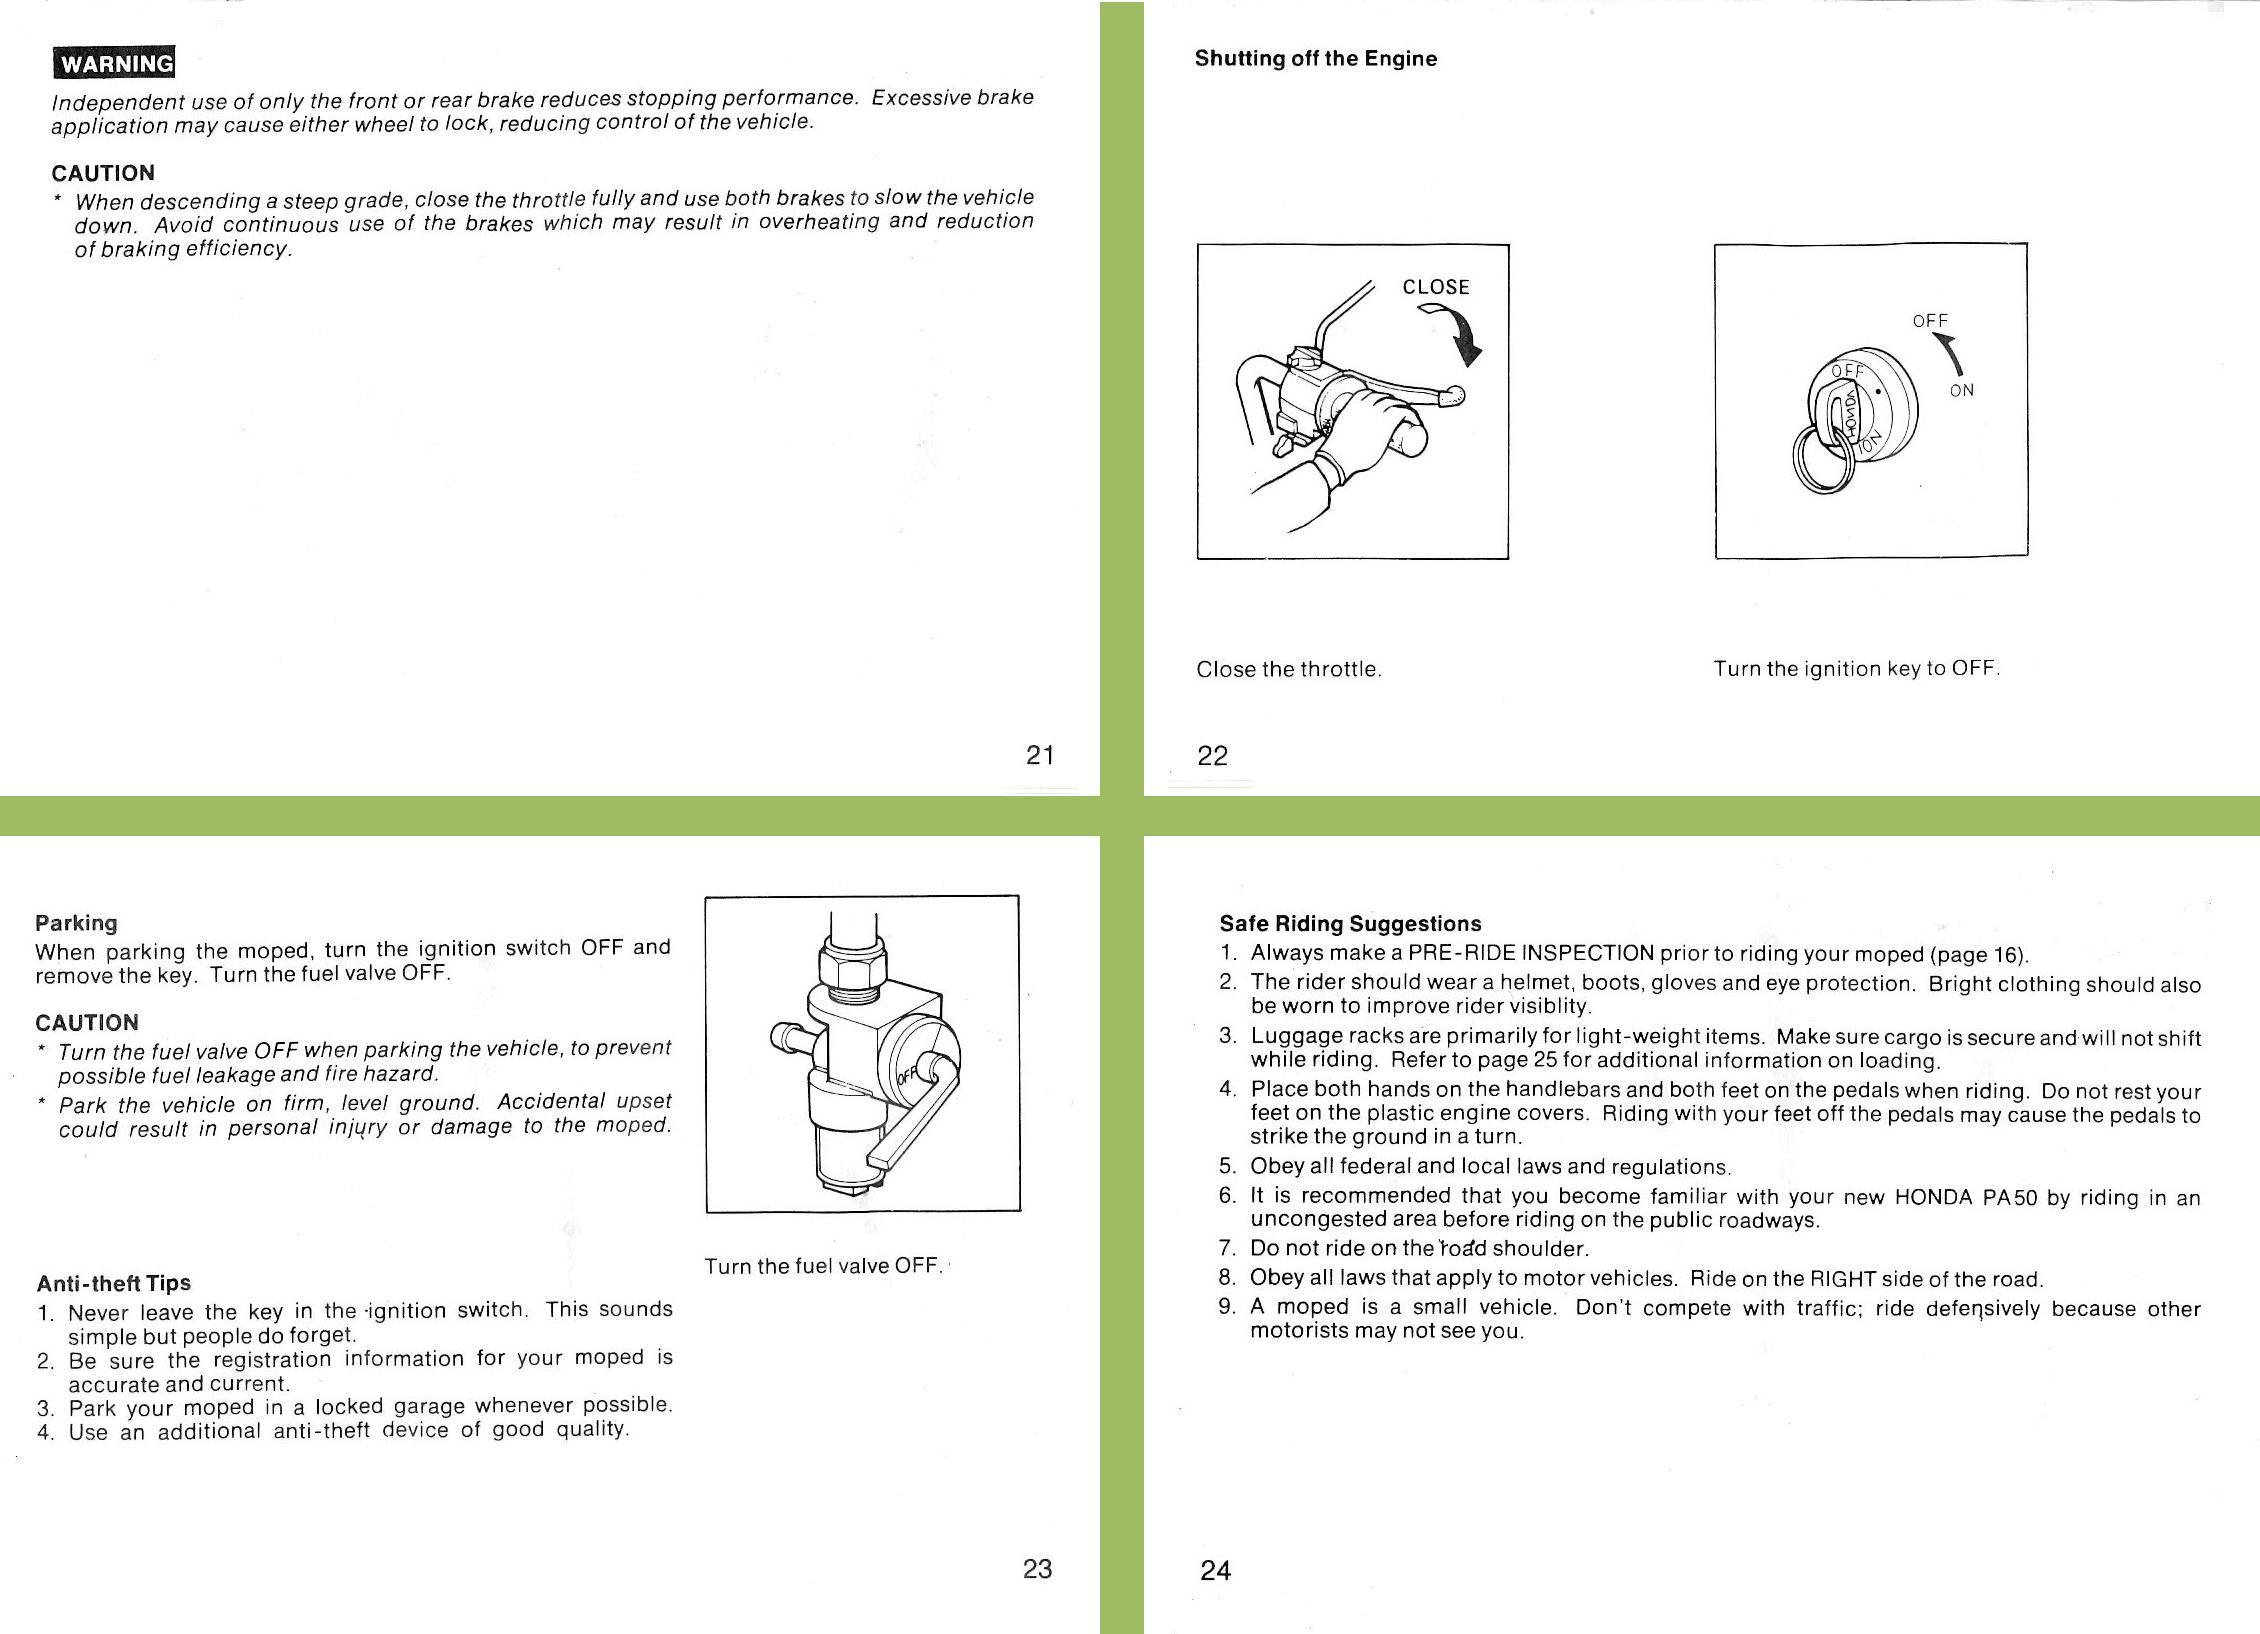 Honda PA50 Owners Manual 21,22,23,24